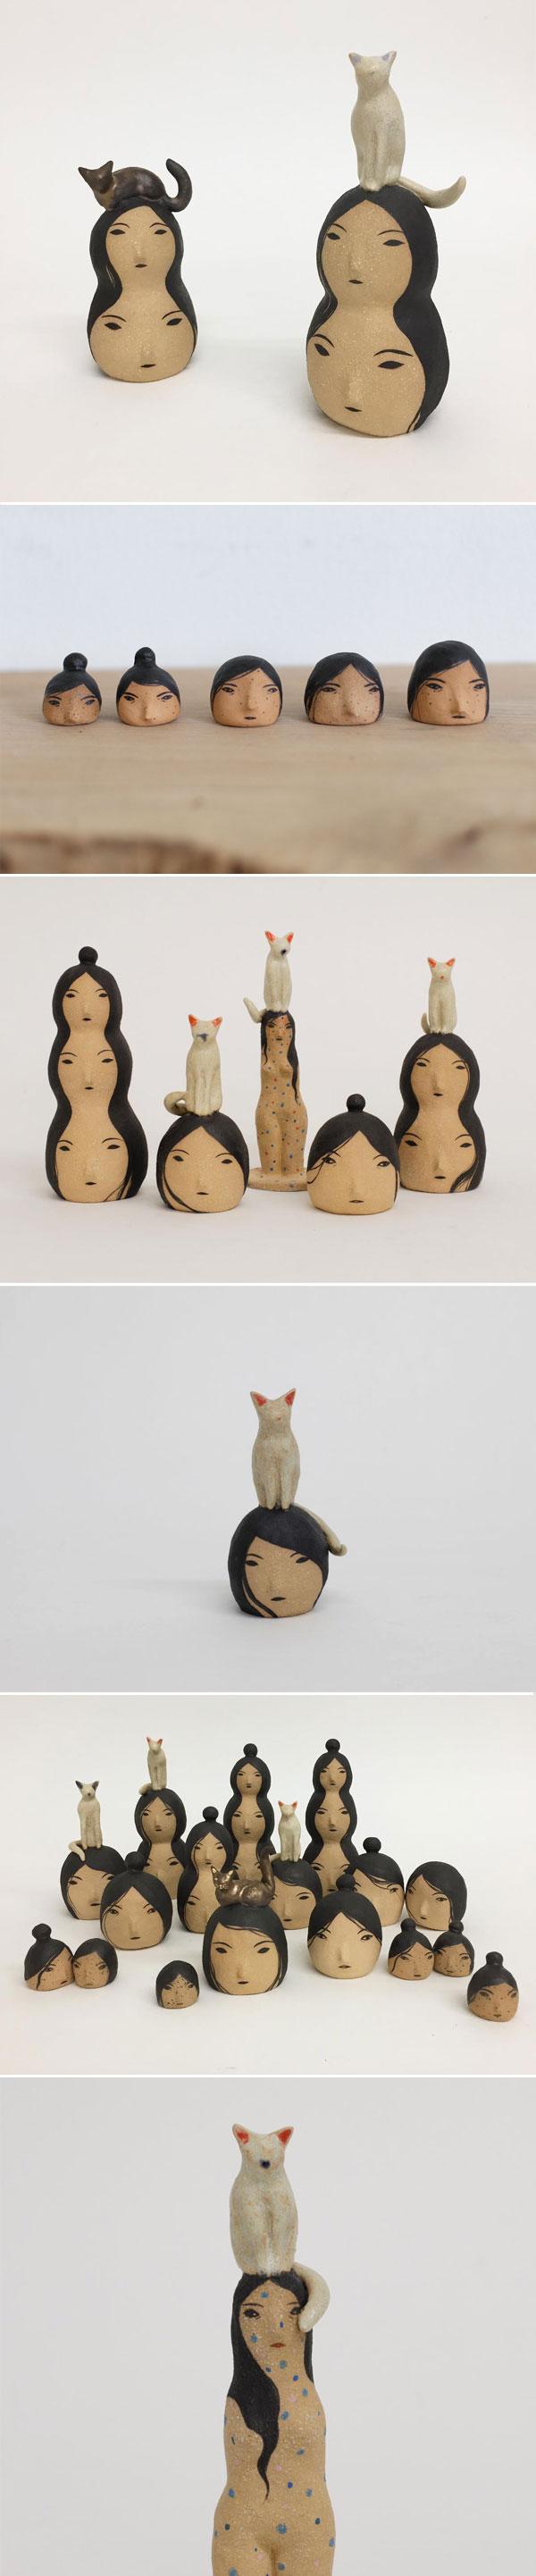 Rami Kim Cerâmica | Ceramics